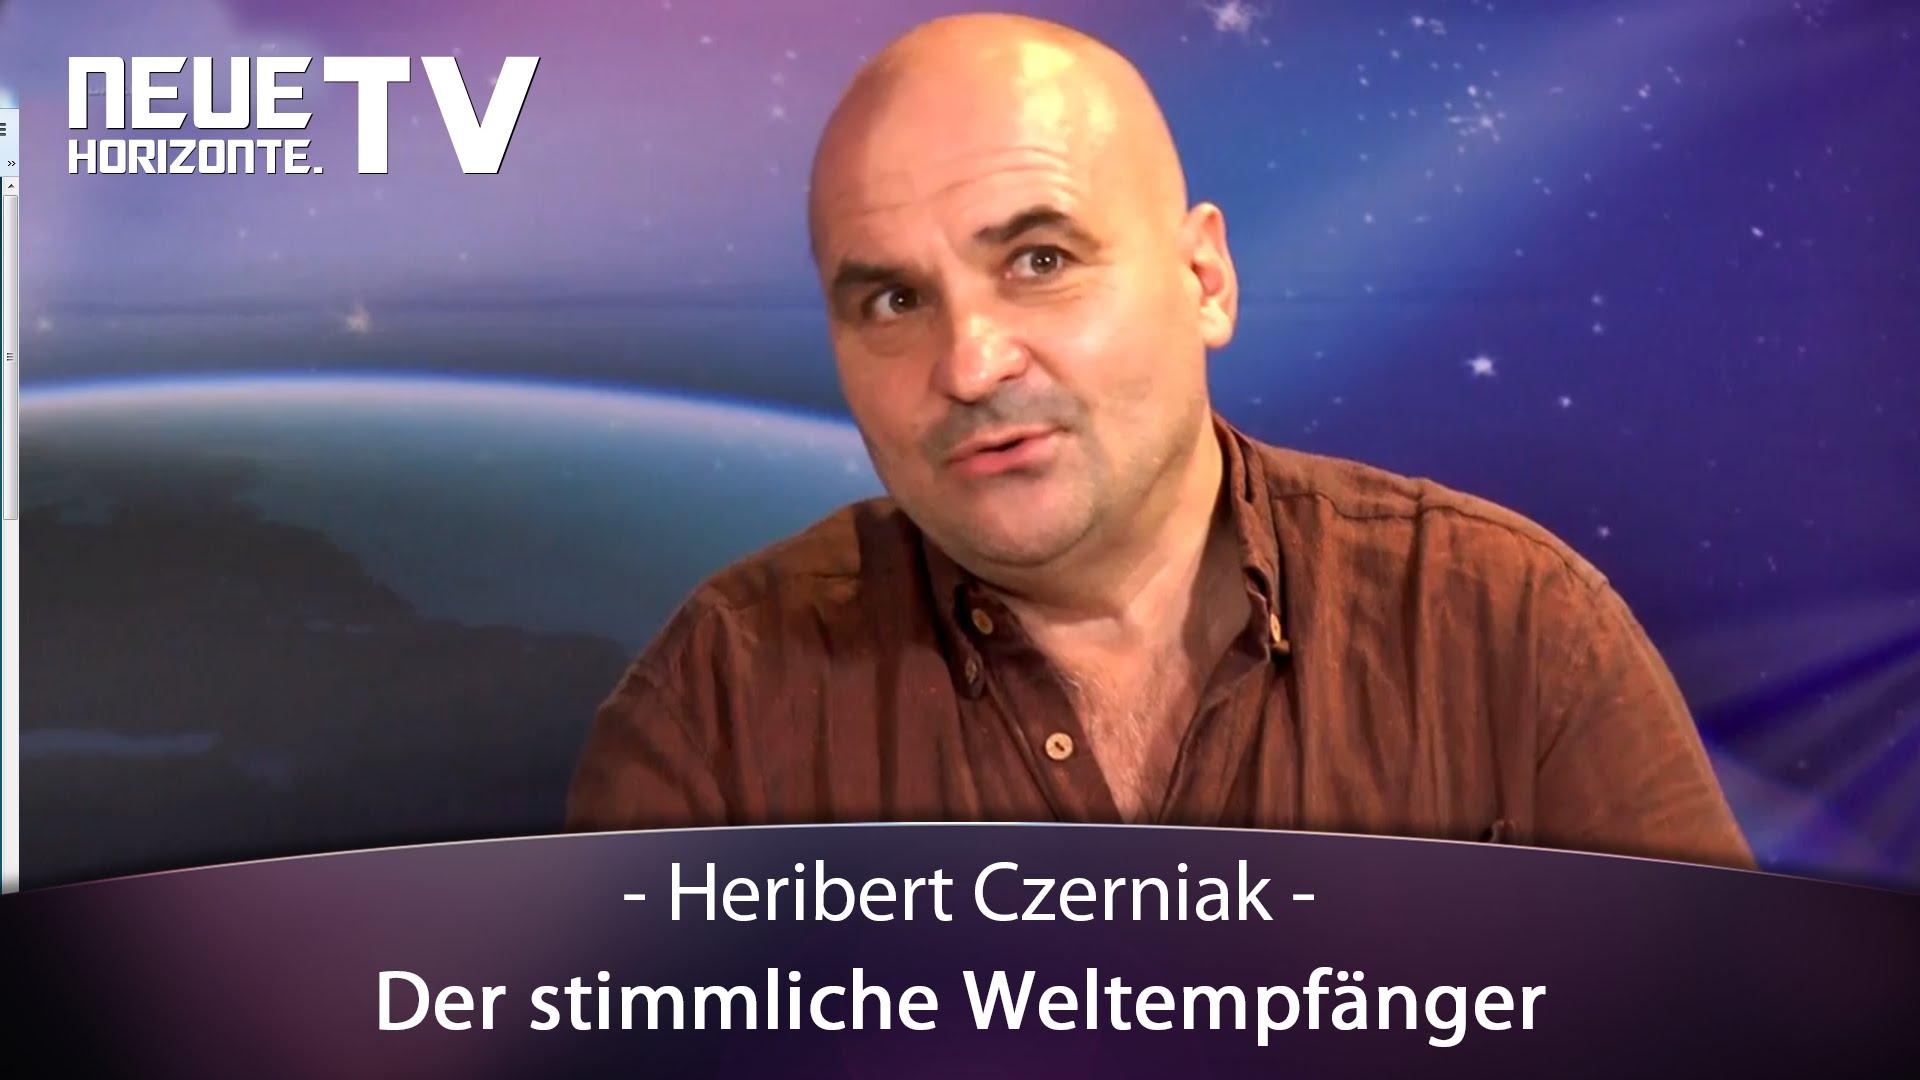 Der stimmlische Weltempfänger – Heribert Czerniak